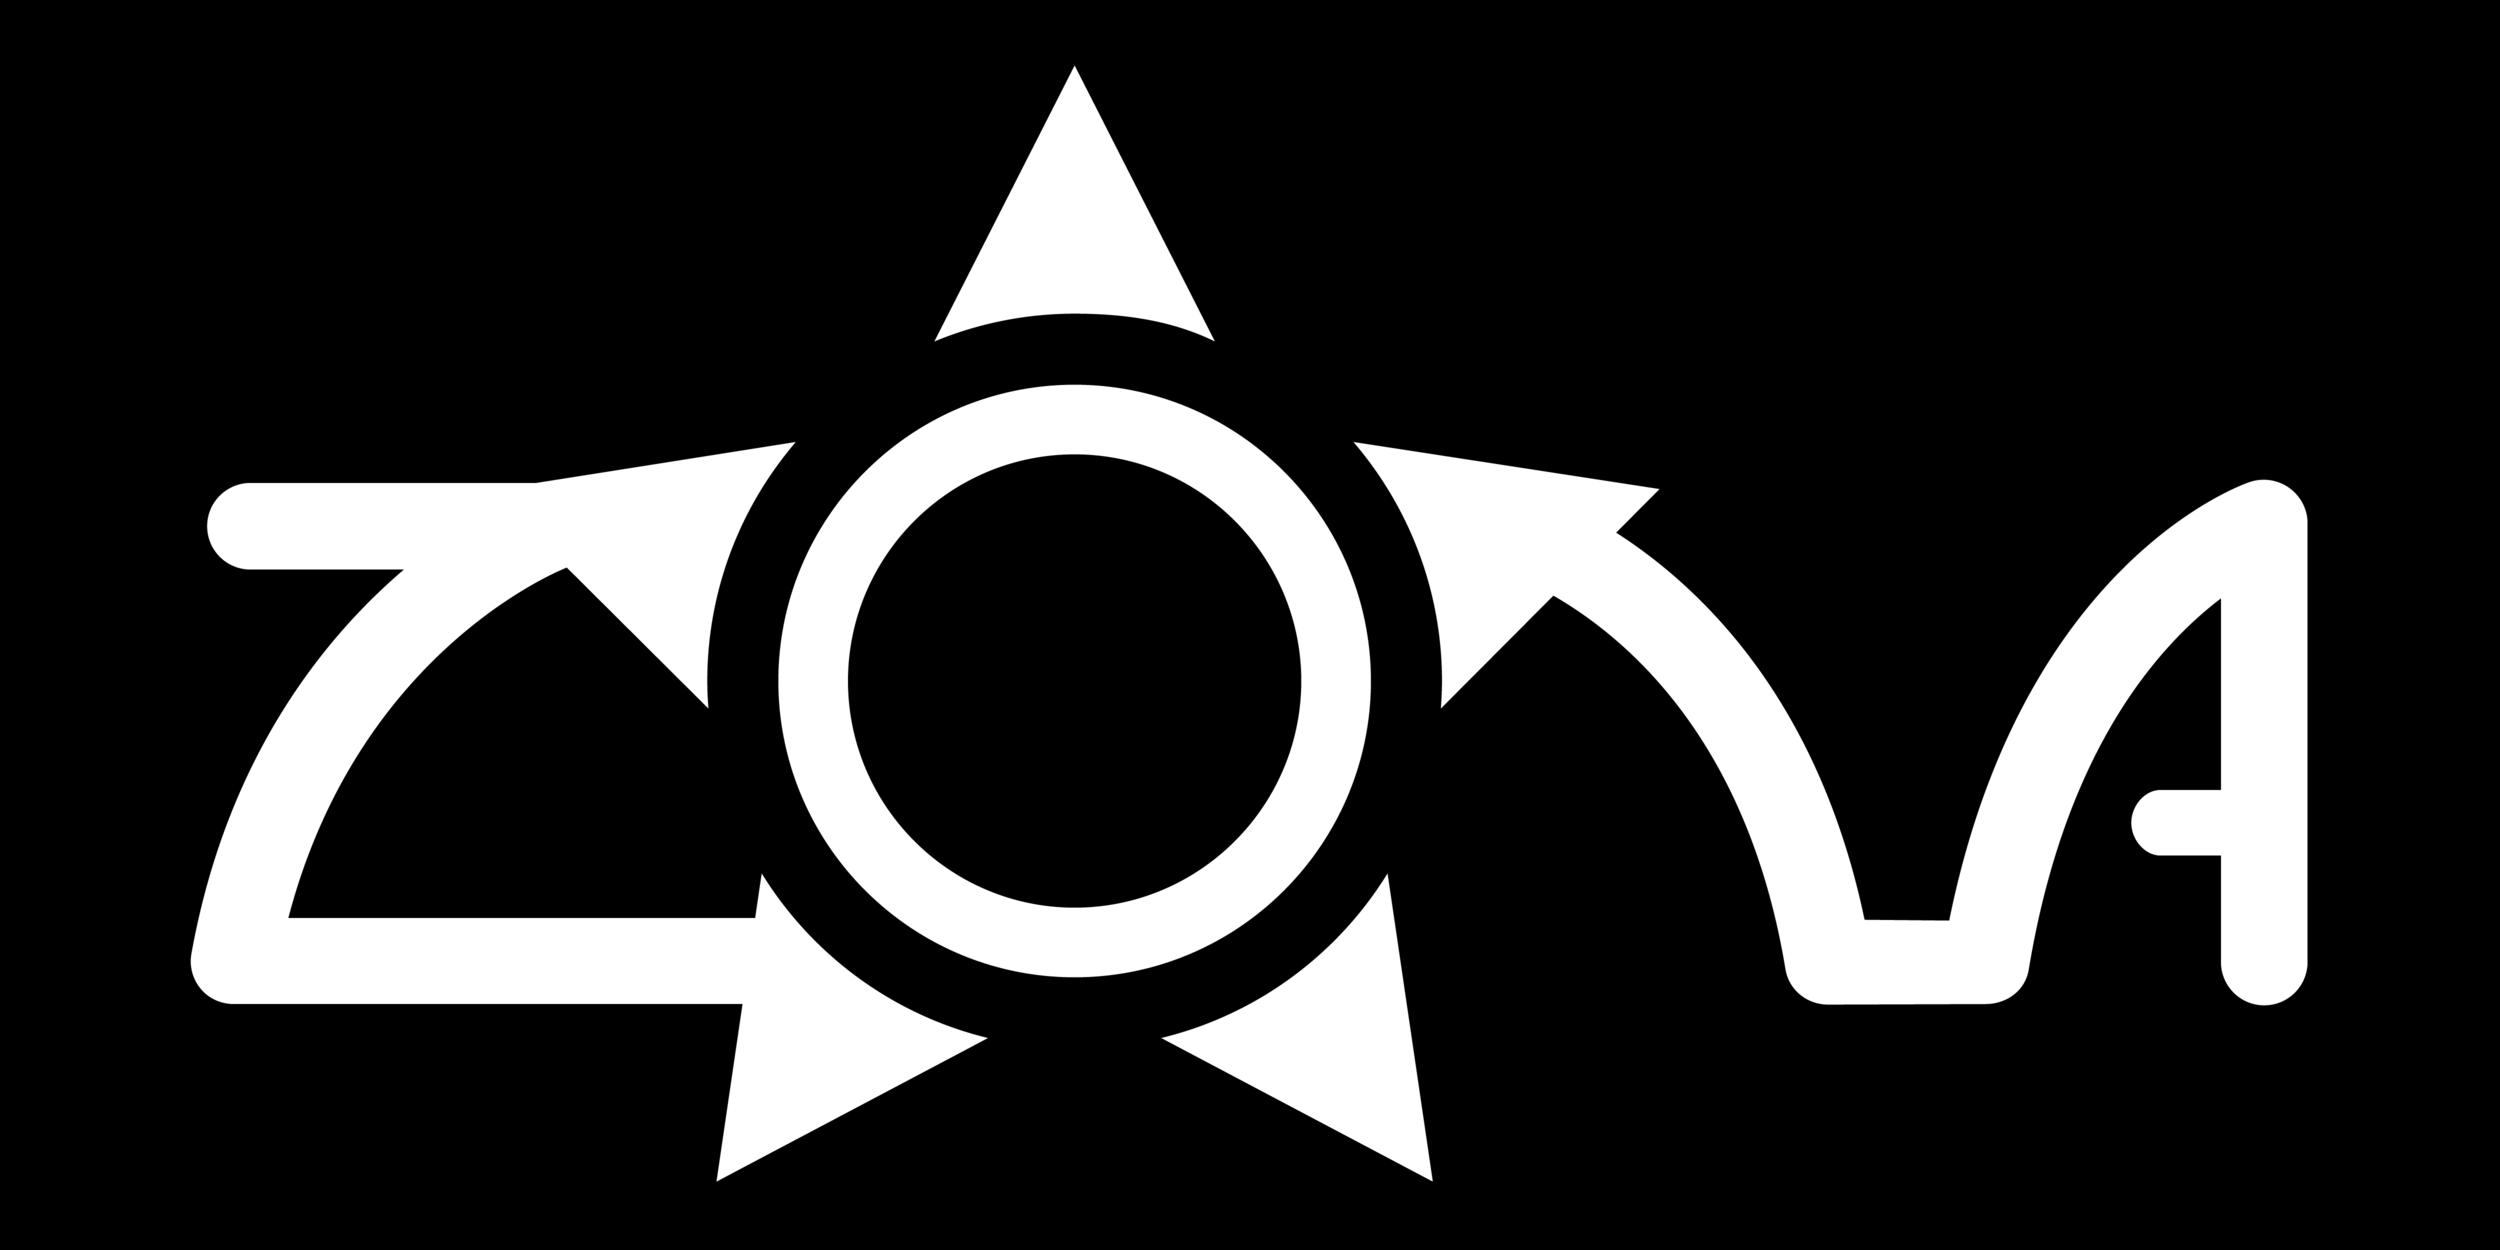 zola-logo-white black background.png